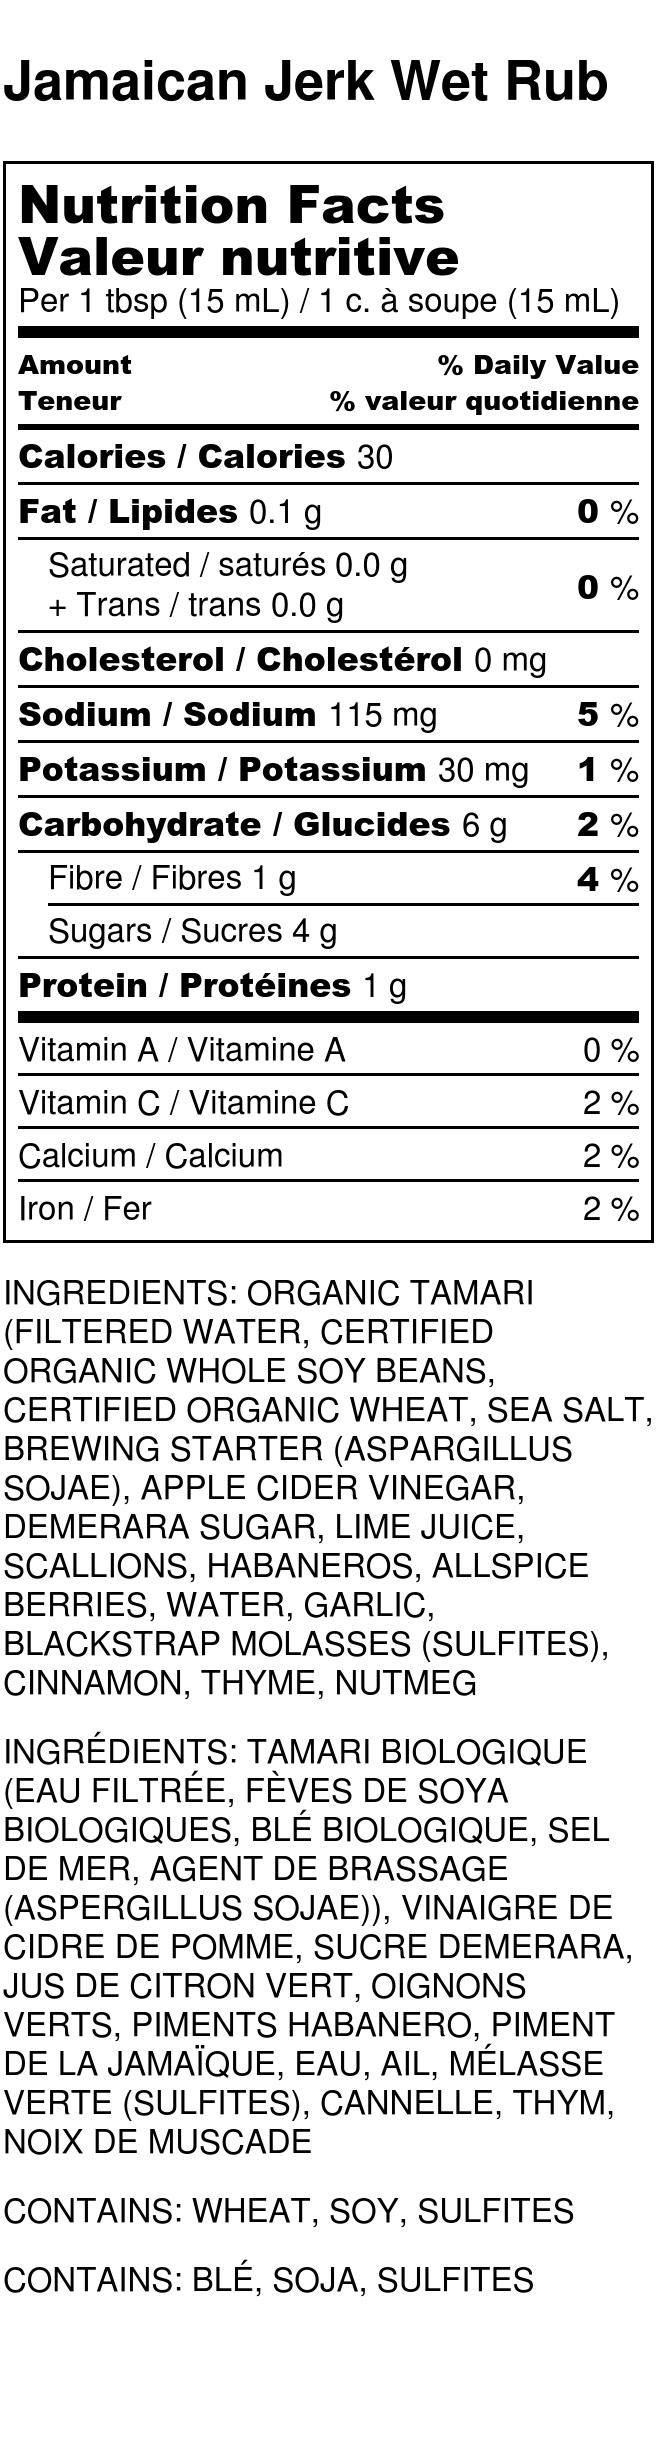 Jamaican Jerk Wet Rub - Nutrition Label.jpg